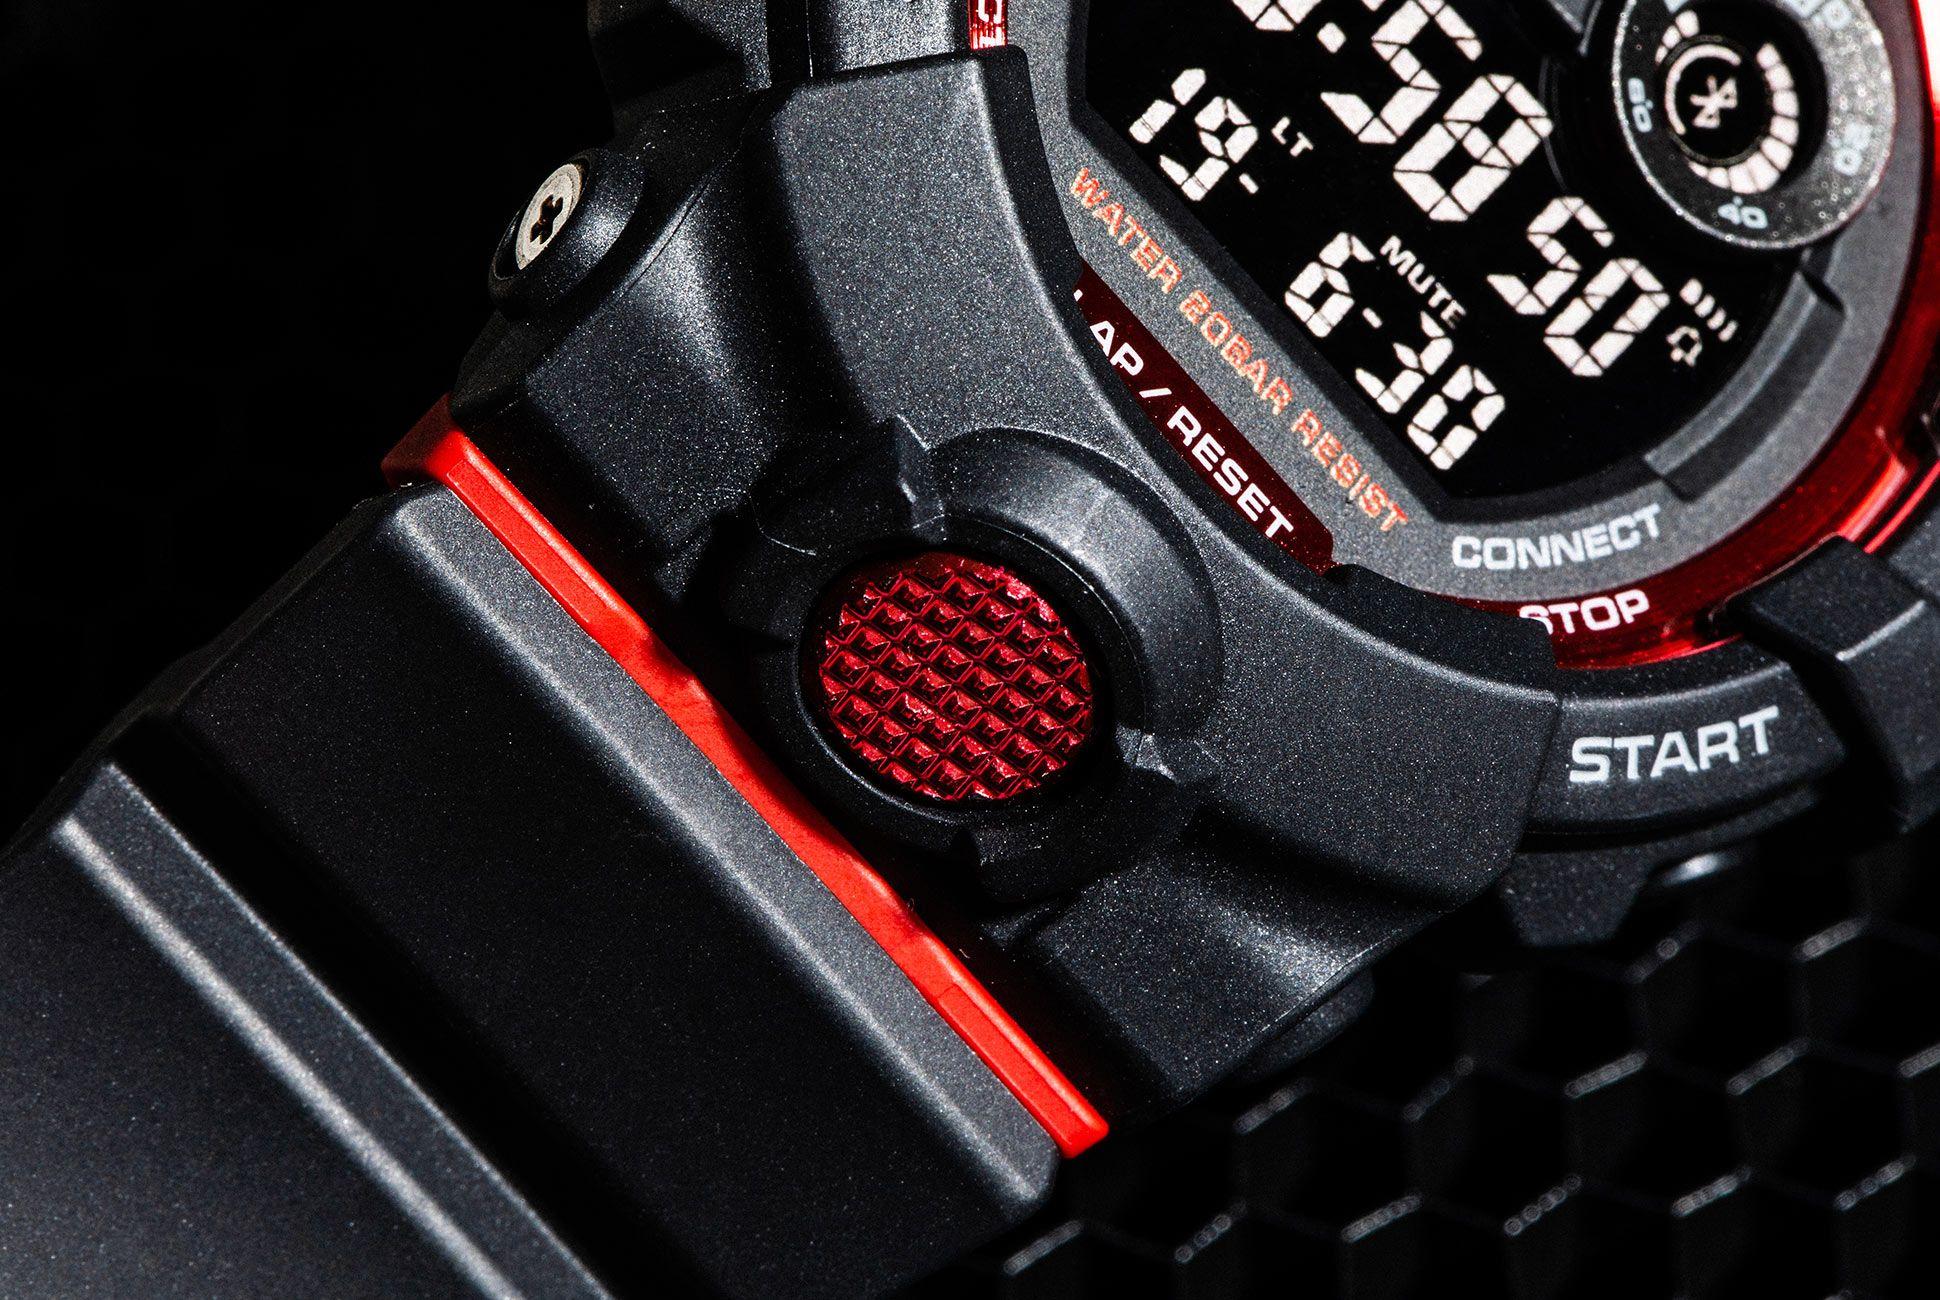 Sponsored-Casio-G-Shock-GBD800-gear-patrol-slide-3